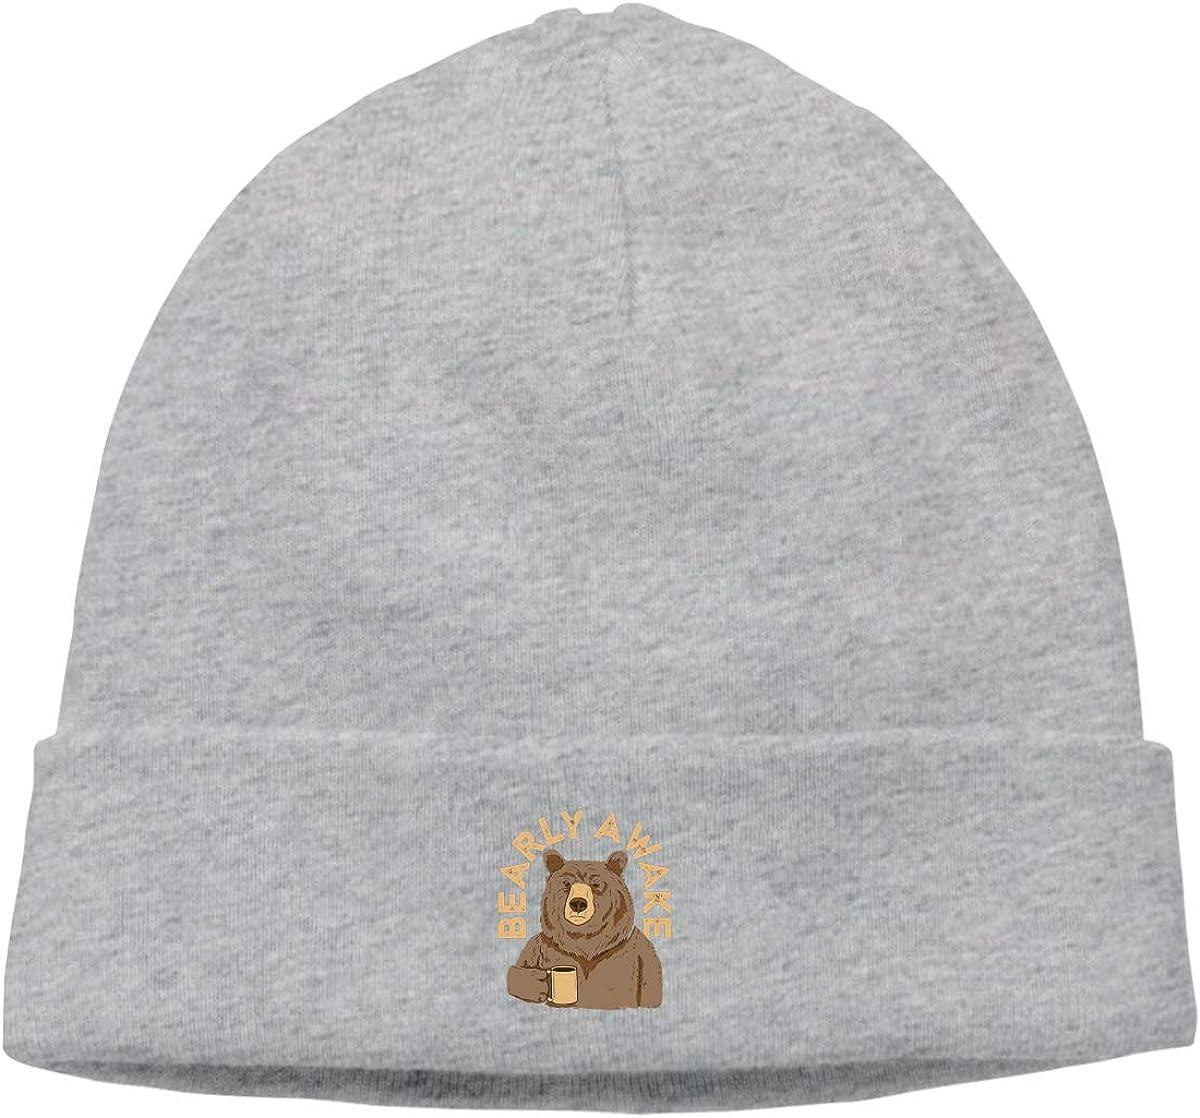 Simoner Bearly Awake Warm Stretchy Solid Daily Skull Cap,Knit Wool Beanie Hat Black